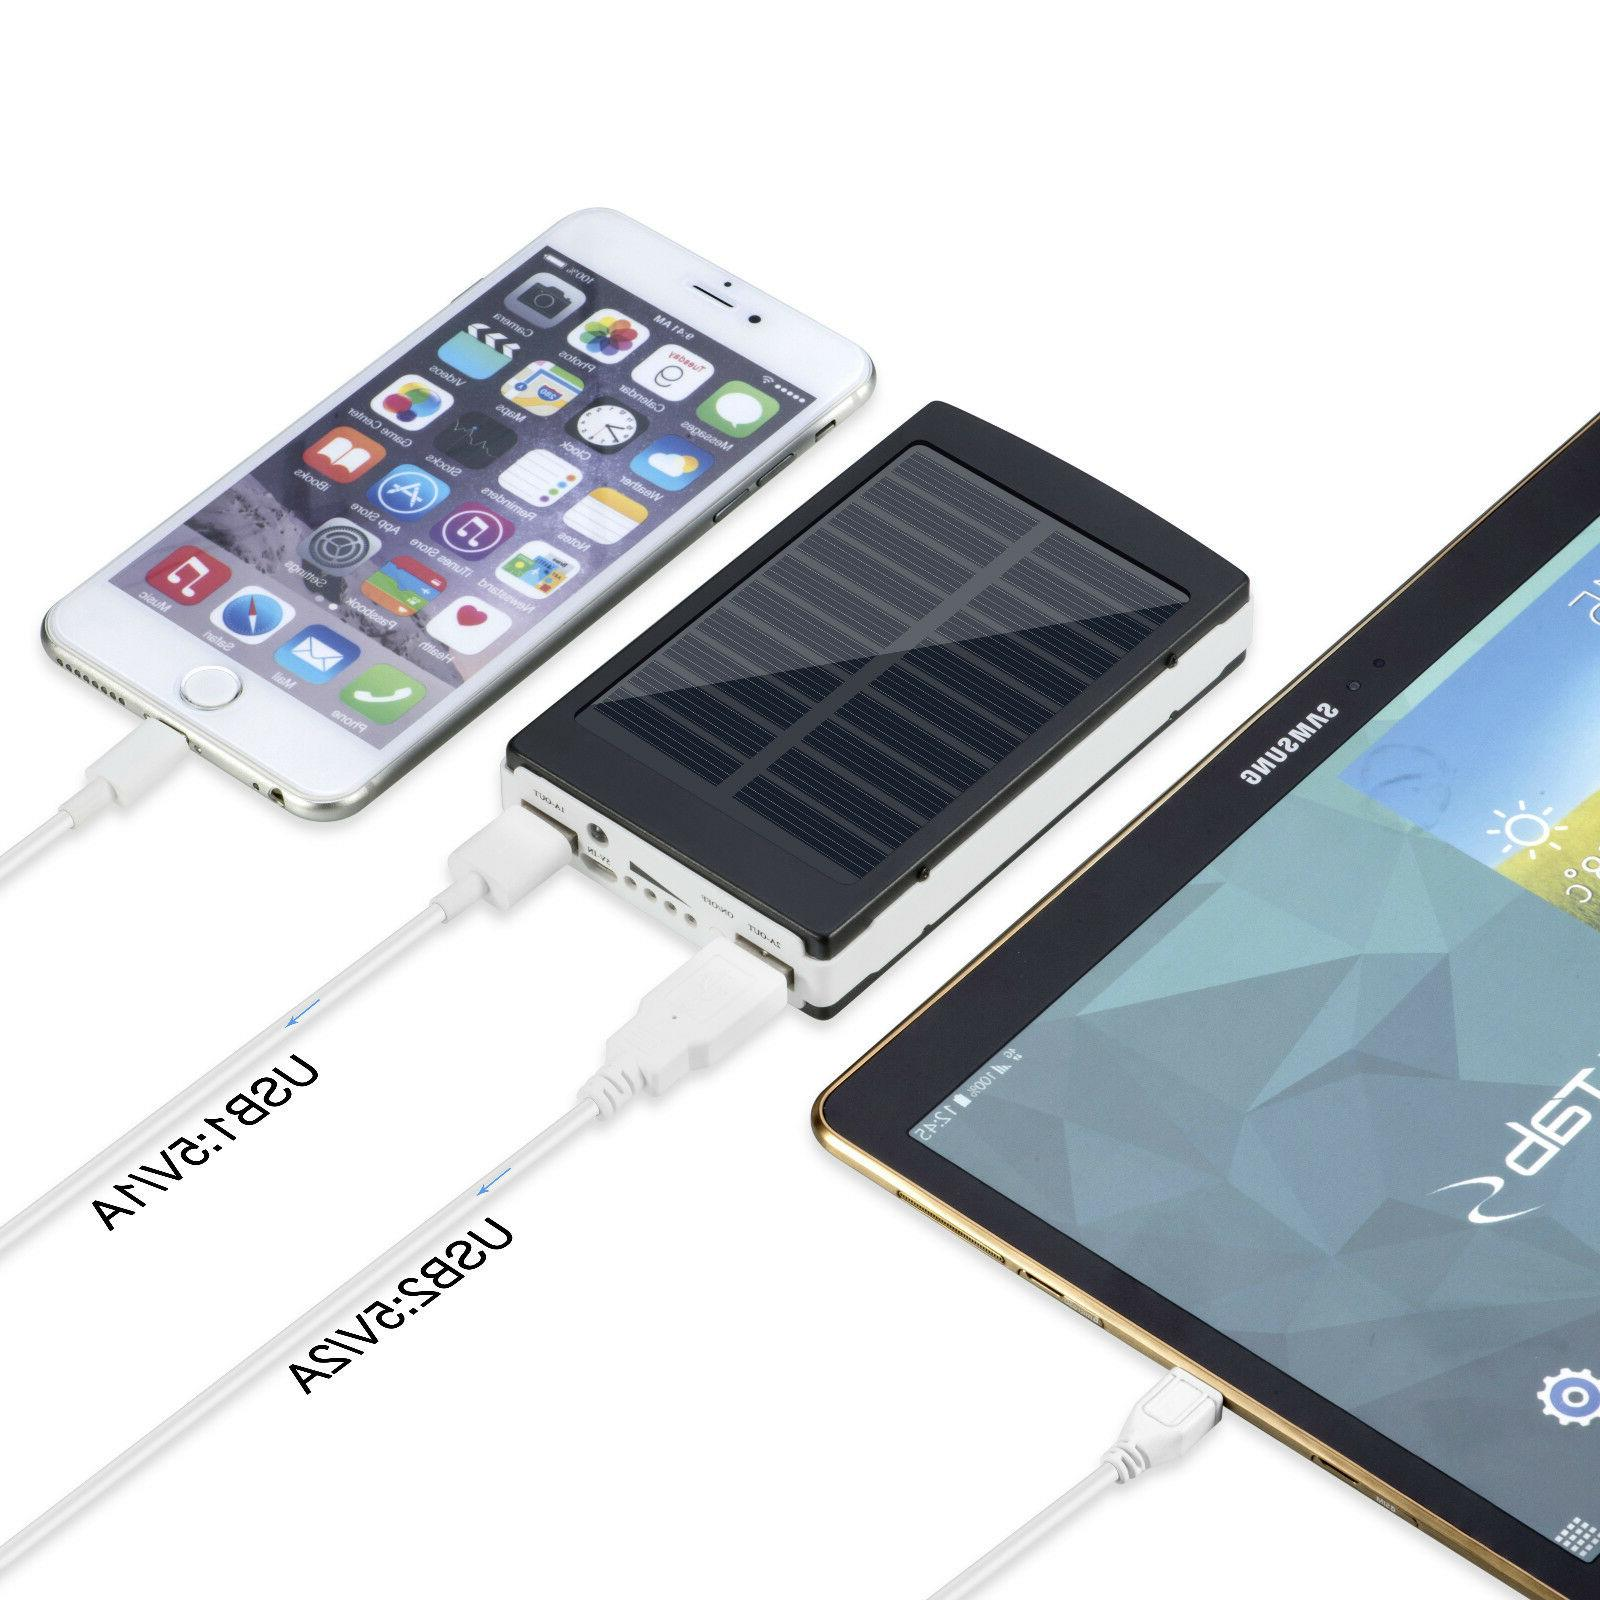 900000mAh USB Portable Power Bank External Backup Charger UltraThin